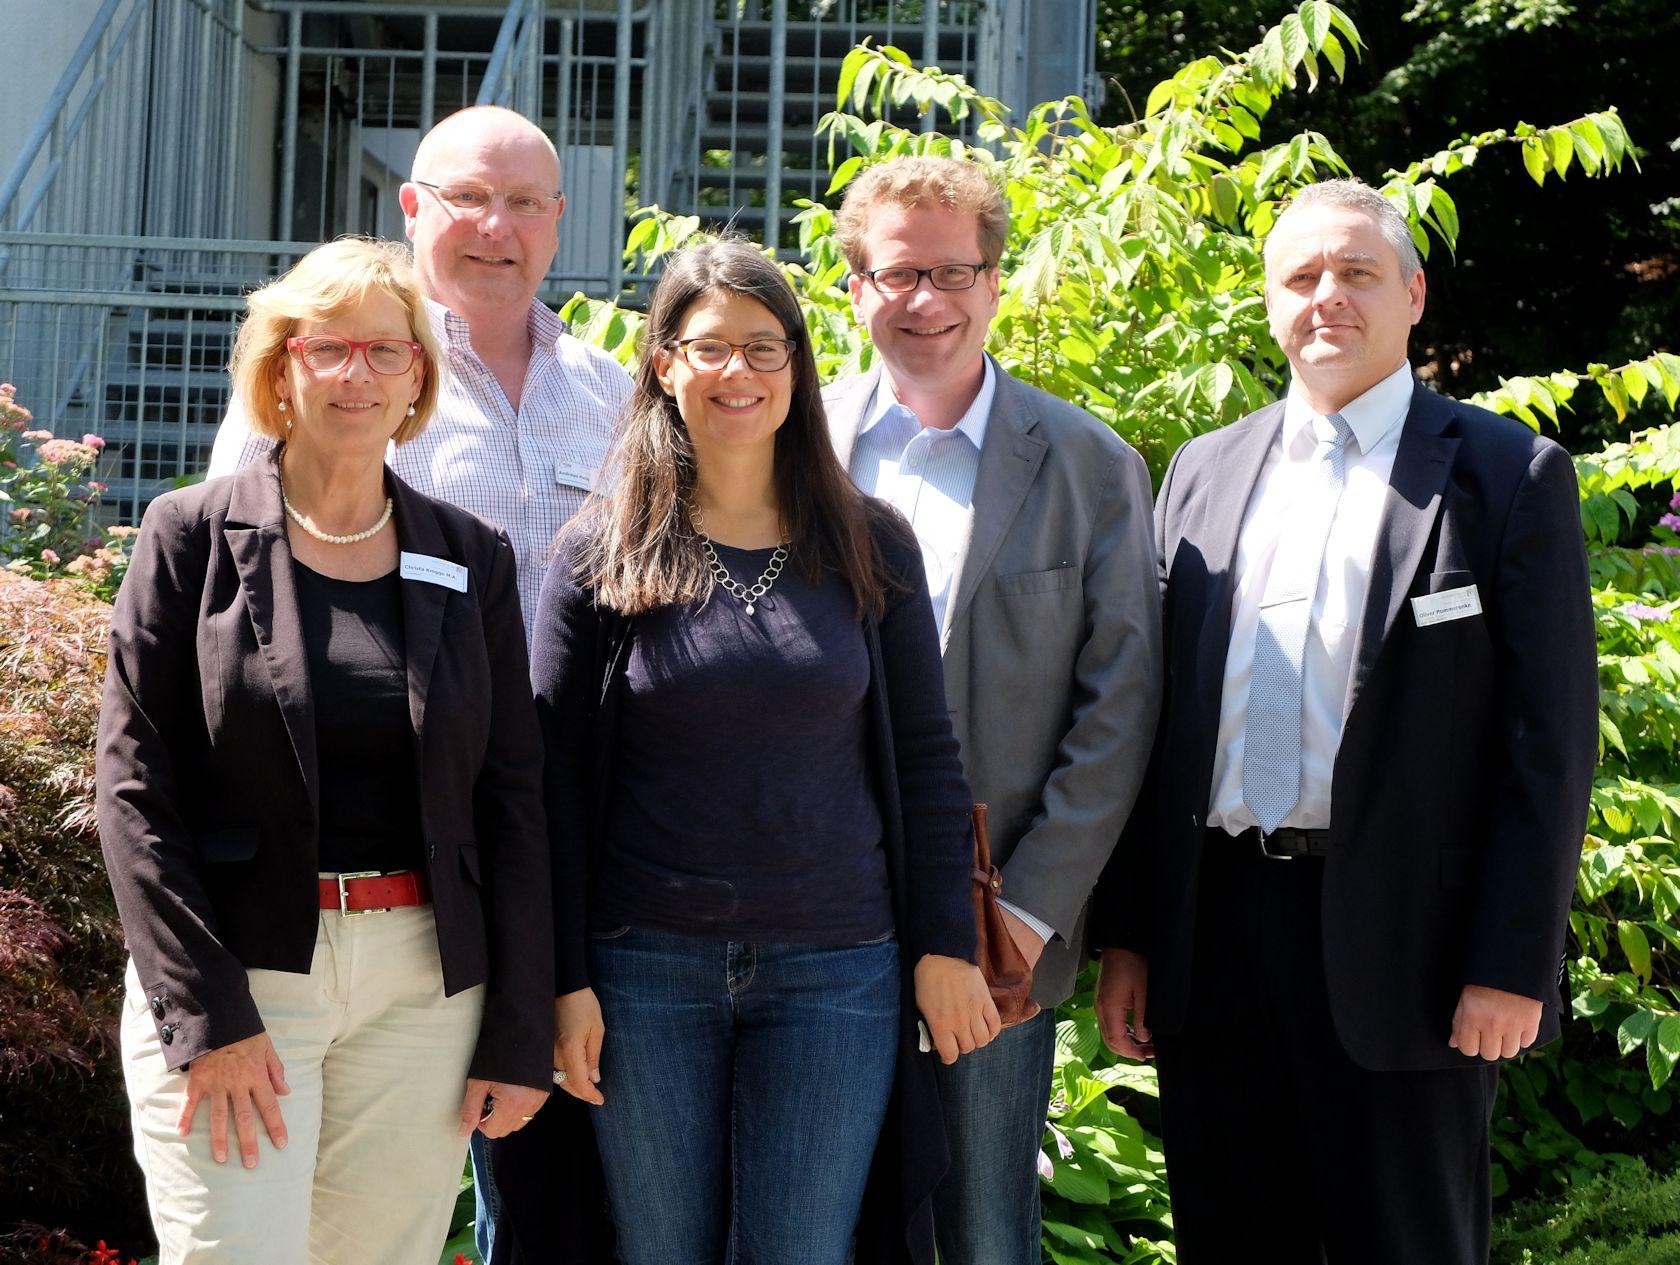 v.l.: Knigge, Hein, Scheer, Habersaat, Pommerenke